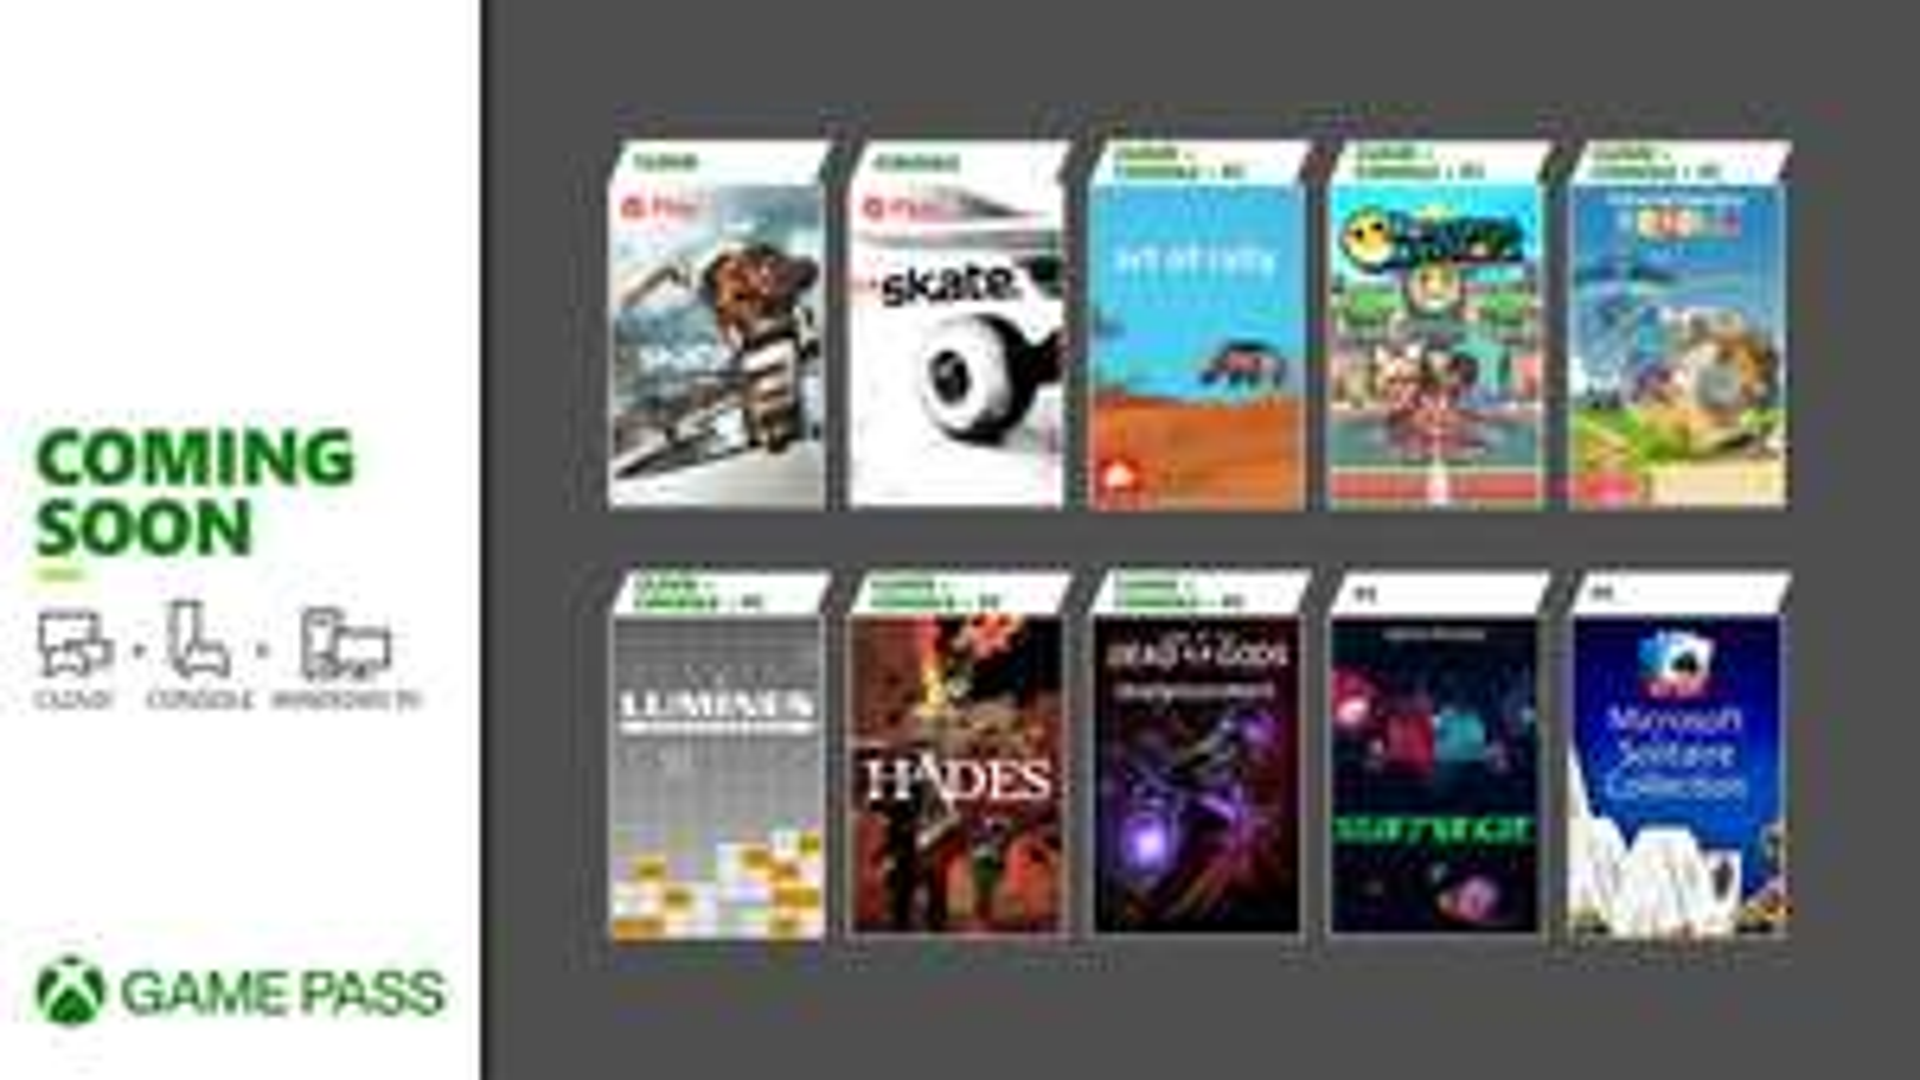 Xbox Game Pass Additions - Hades, Katamari Damacy Reroll, Skate 3, Lumines + Dirt 4, Dirt Rally, Dirt Rally 2.0, Grid, F1 2020 via EA Play